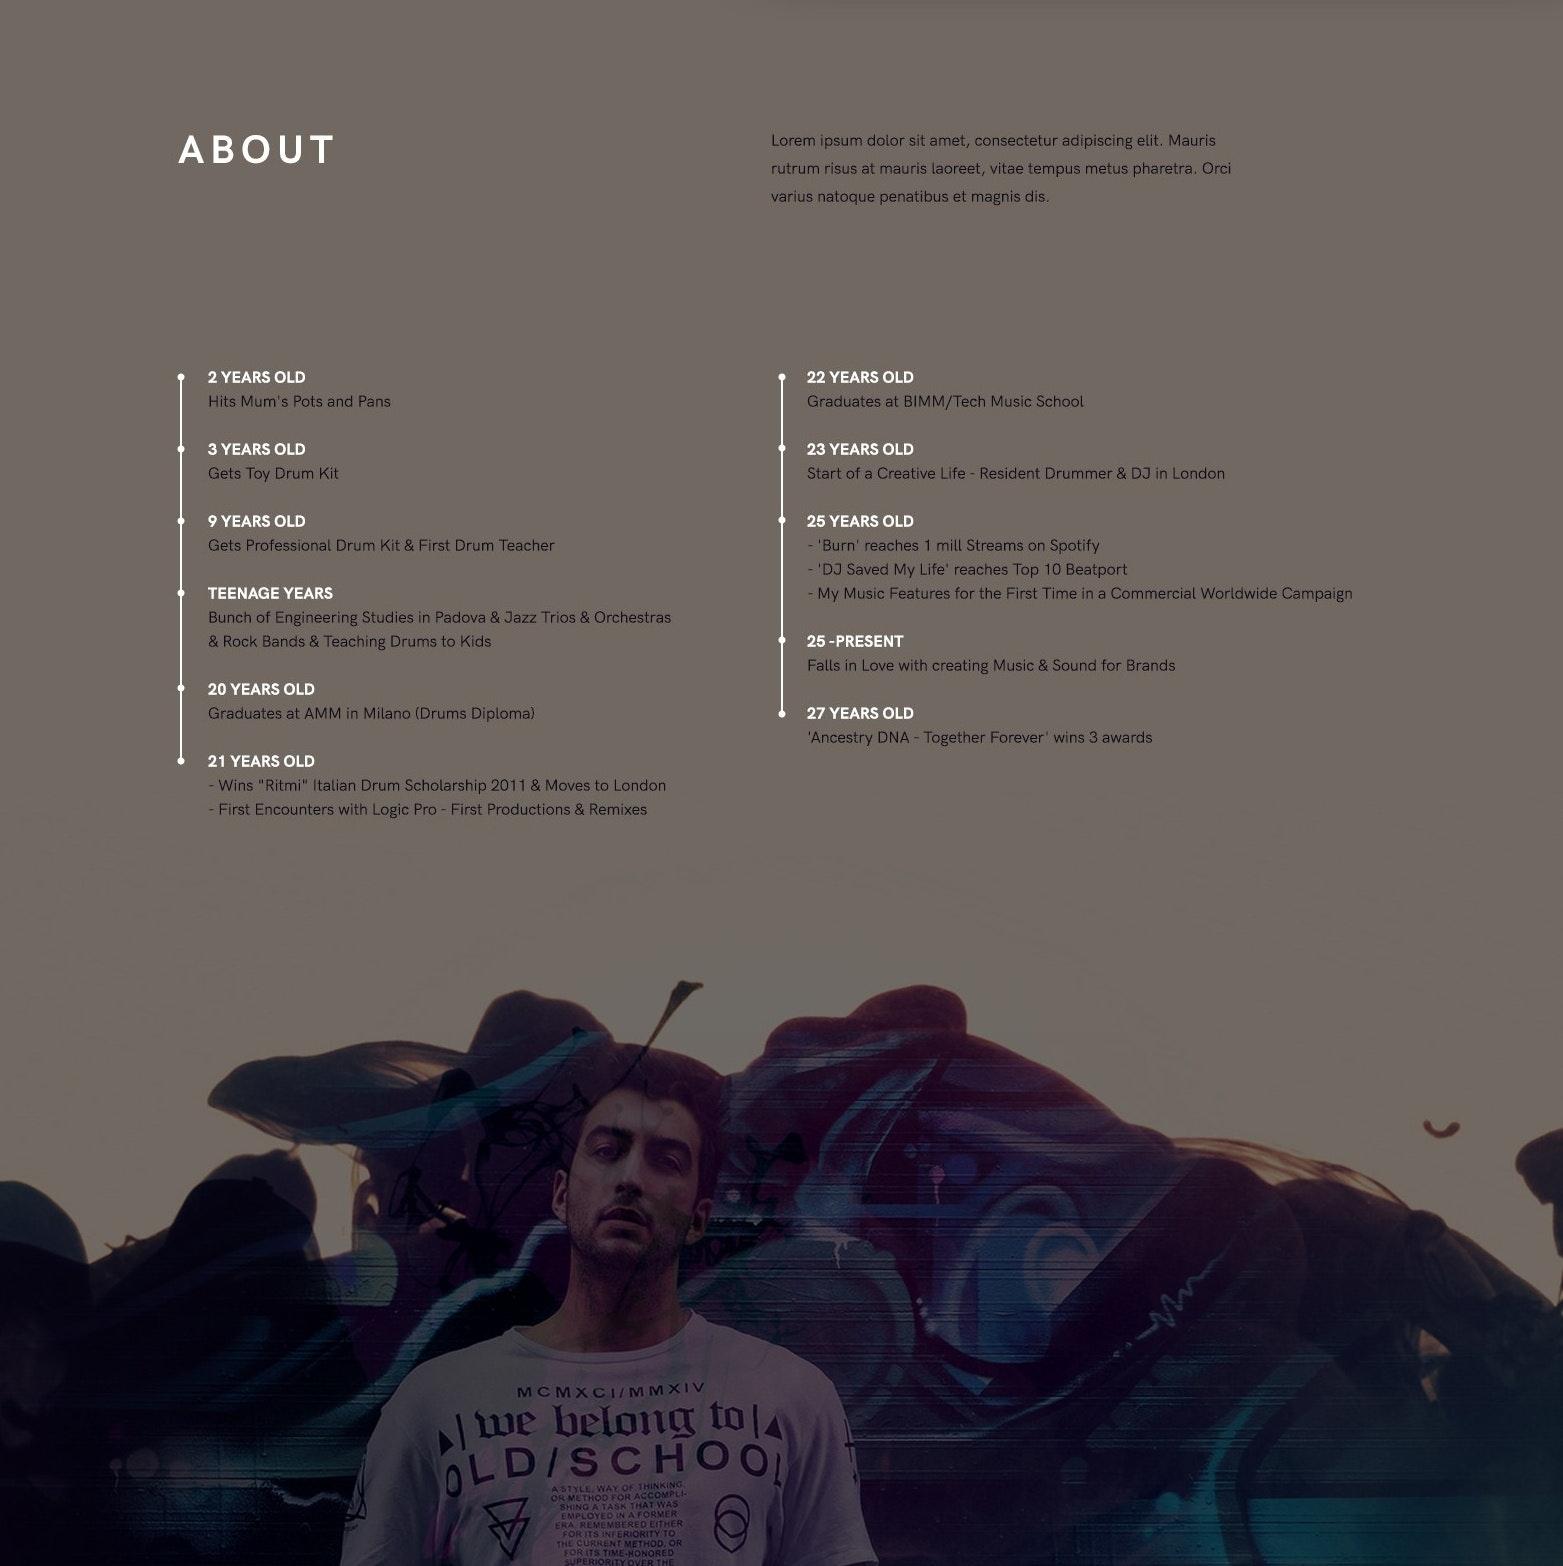 Andrea Saccardo web design